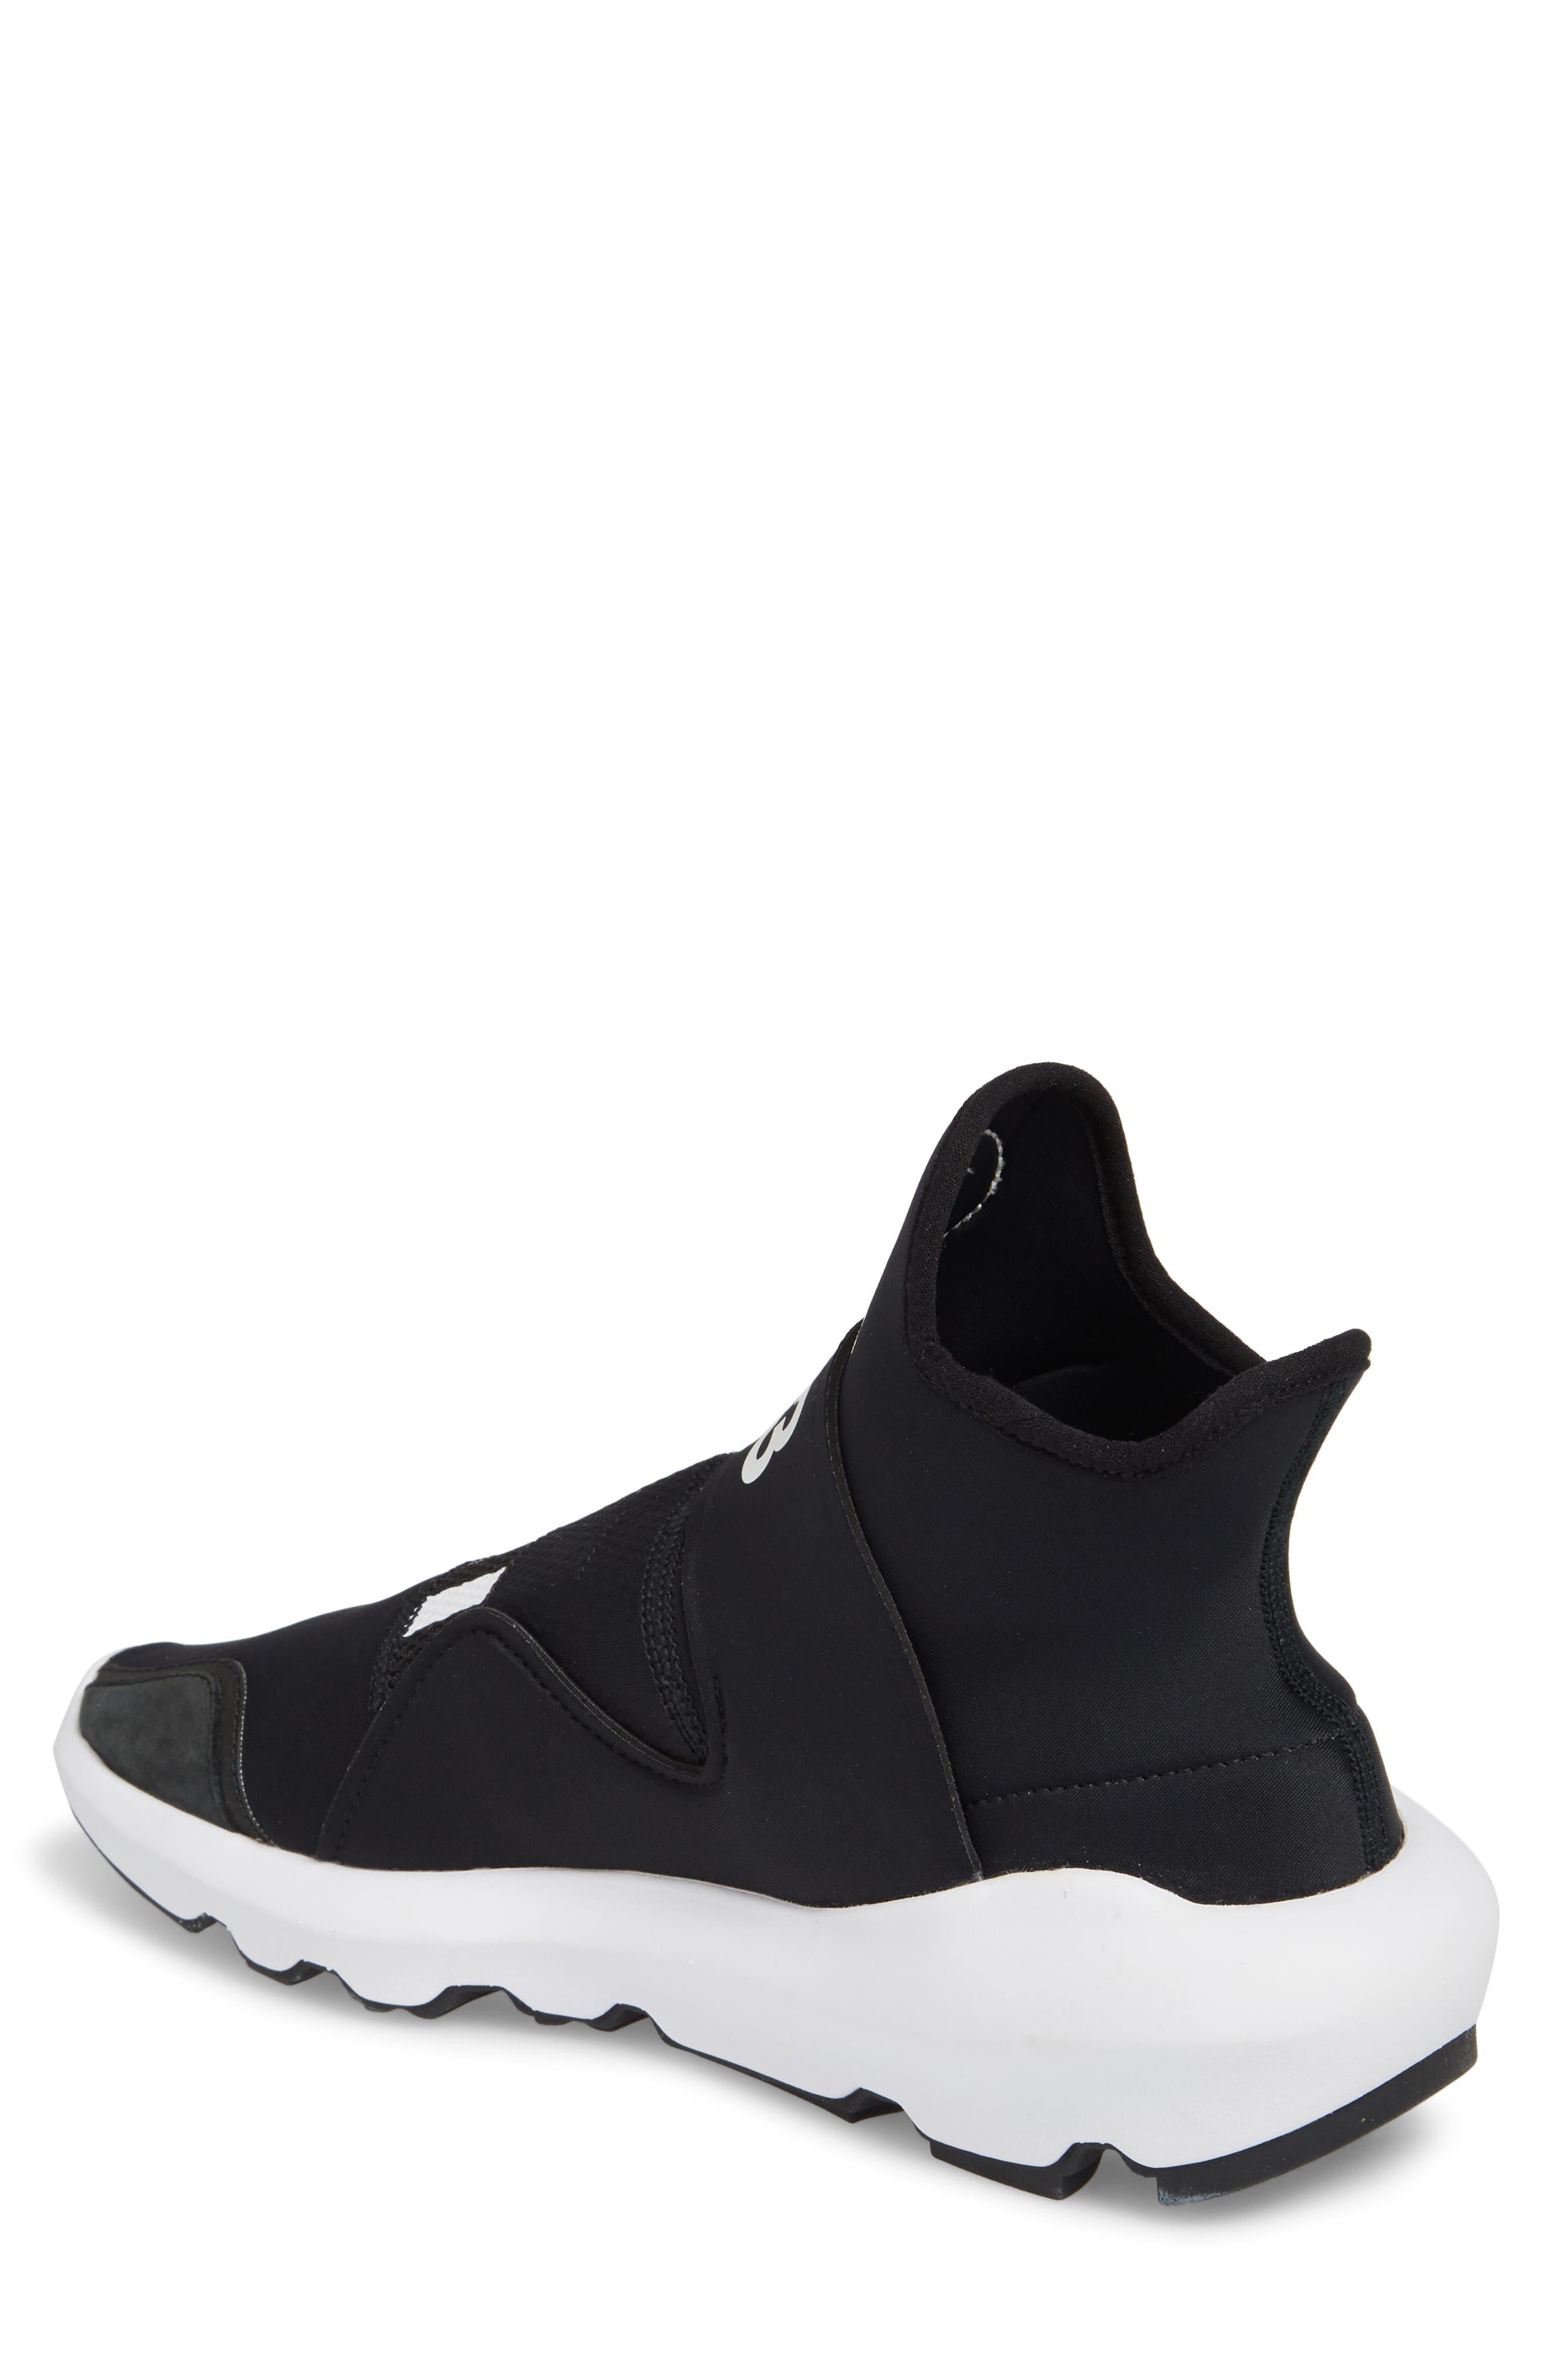 x adidas Suberou Sneaker,                             Alternate thumbnail 2, color,                             010